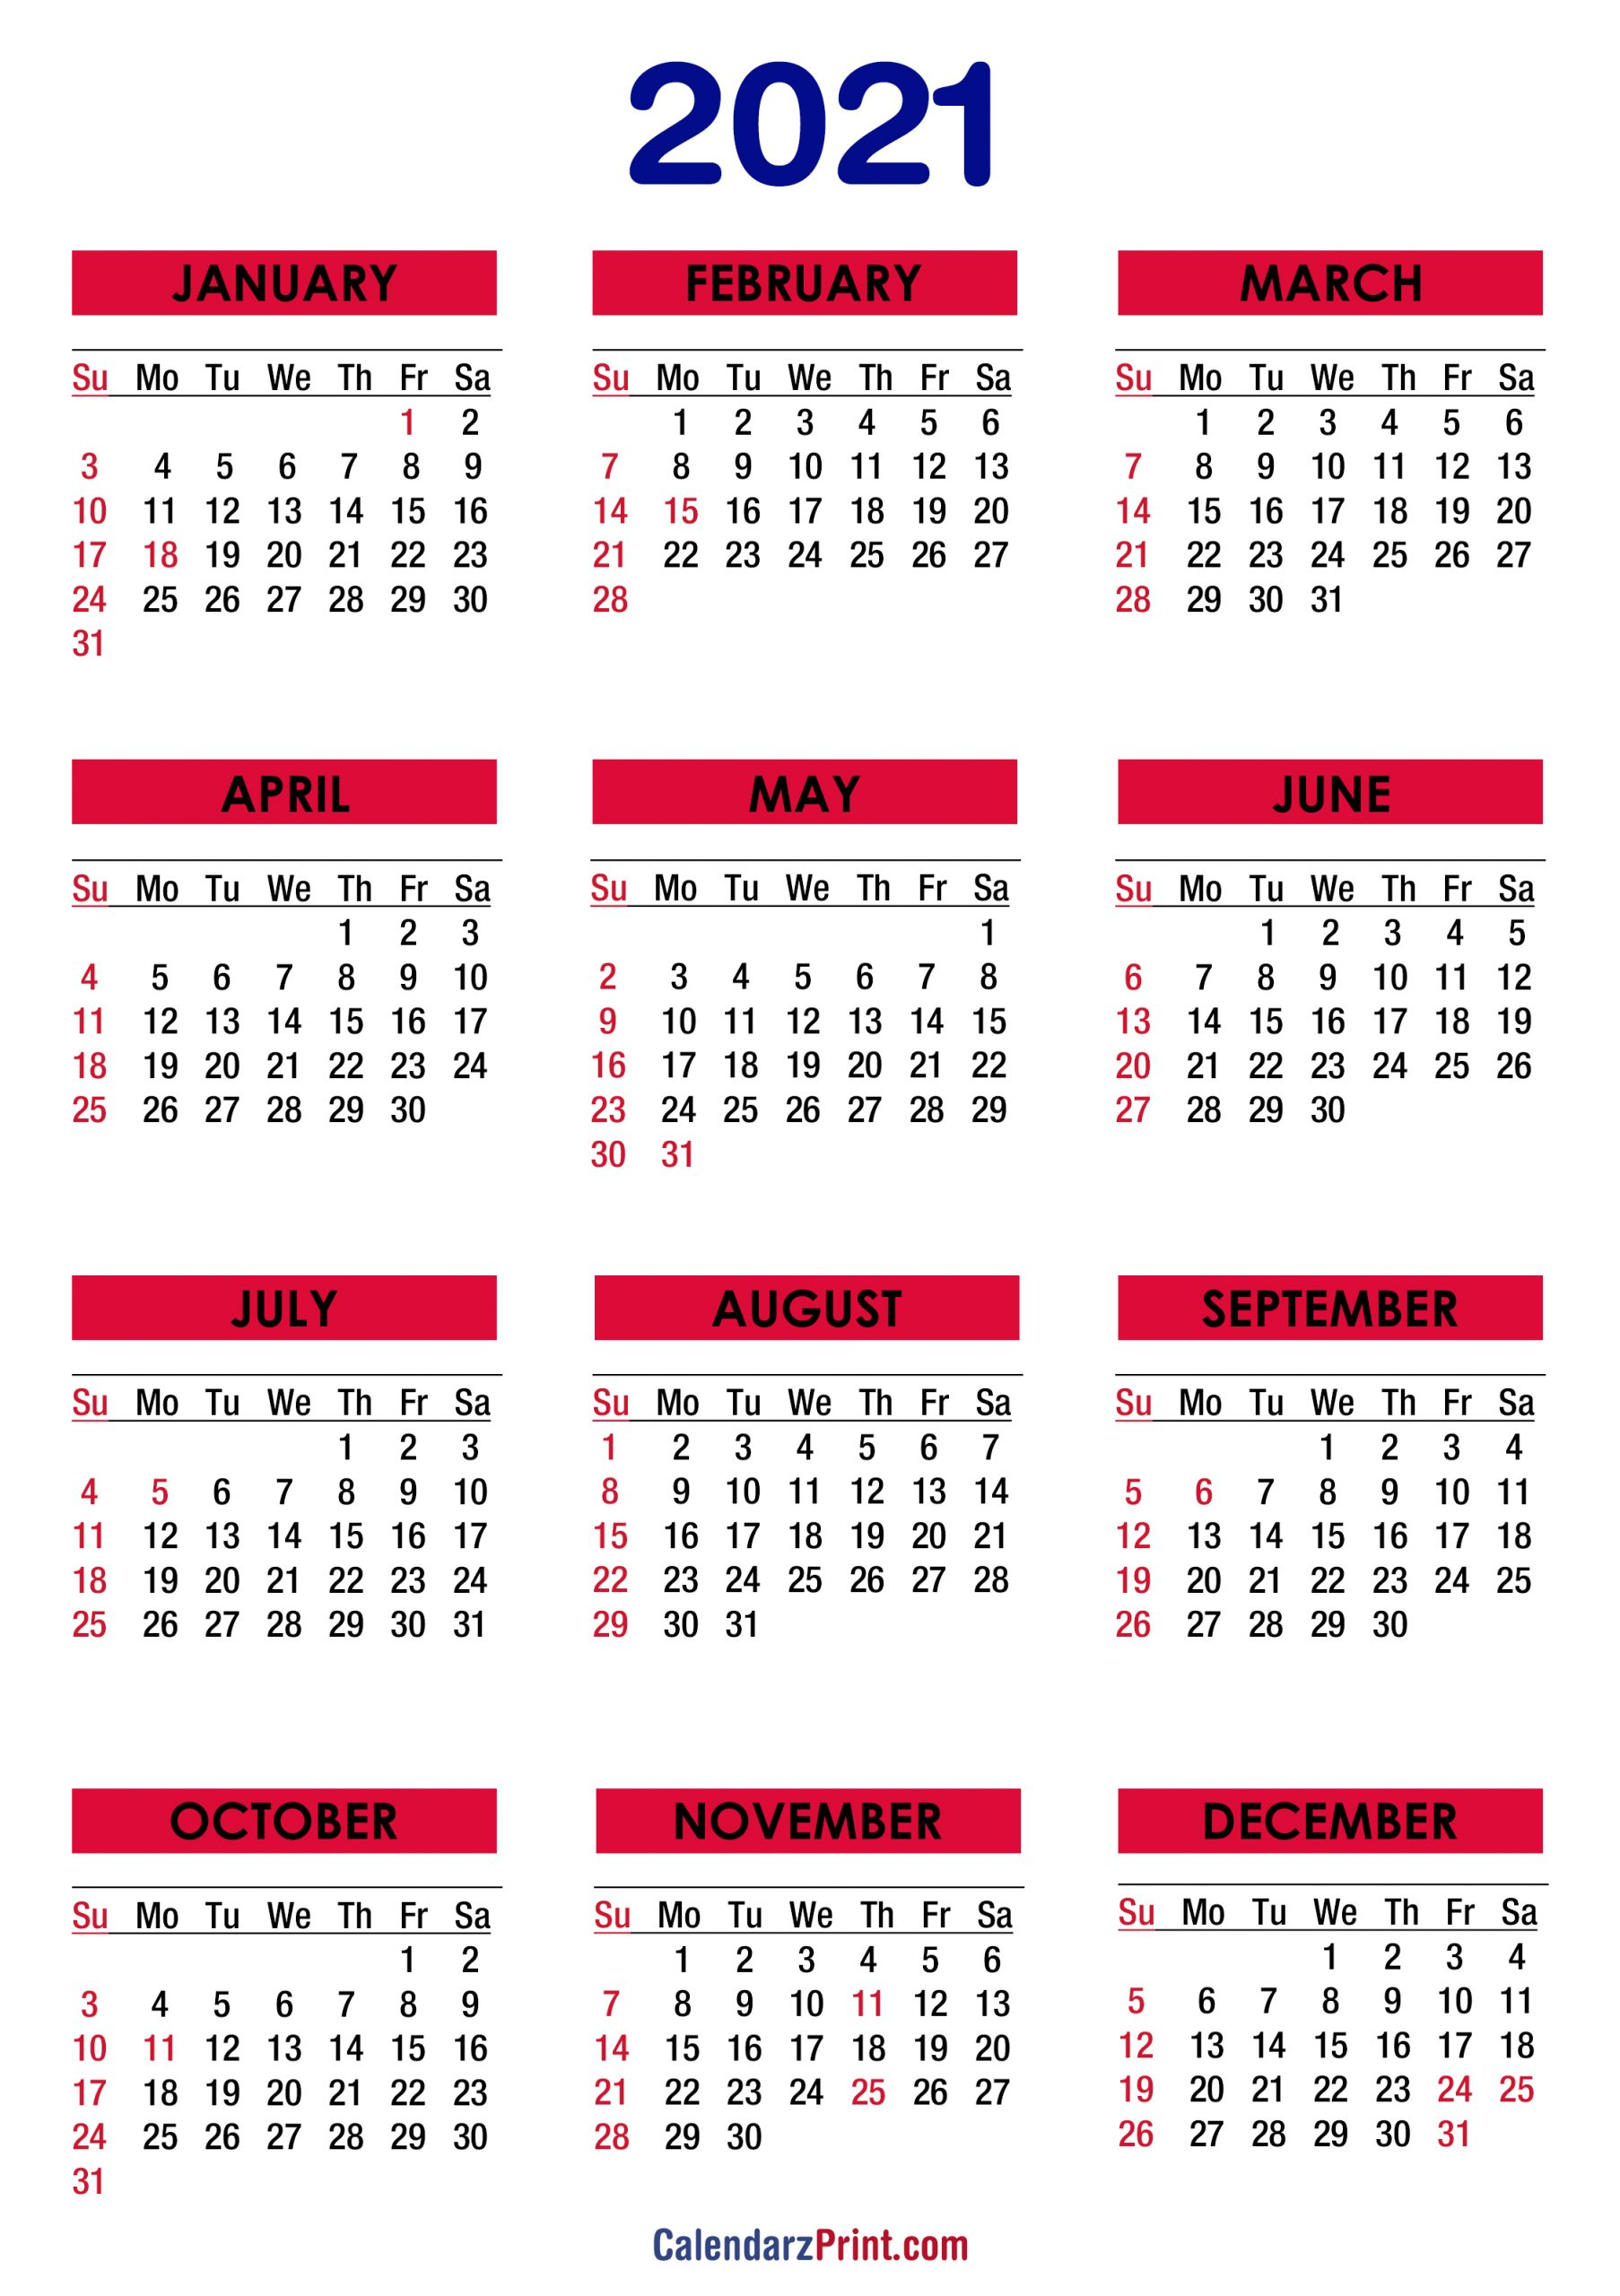 2021 Calendar With Holidays Printable Free Colorful 2